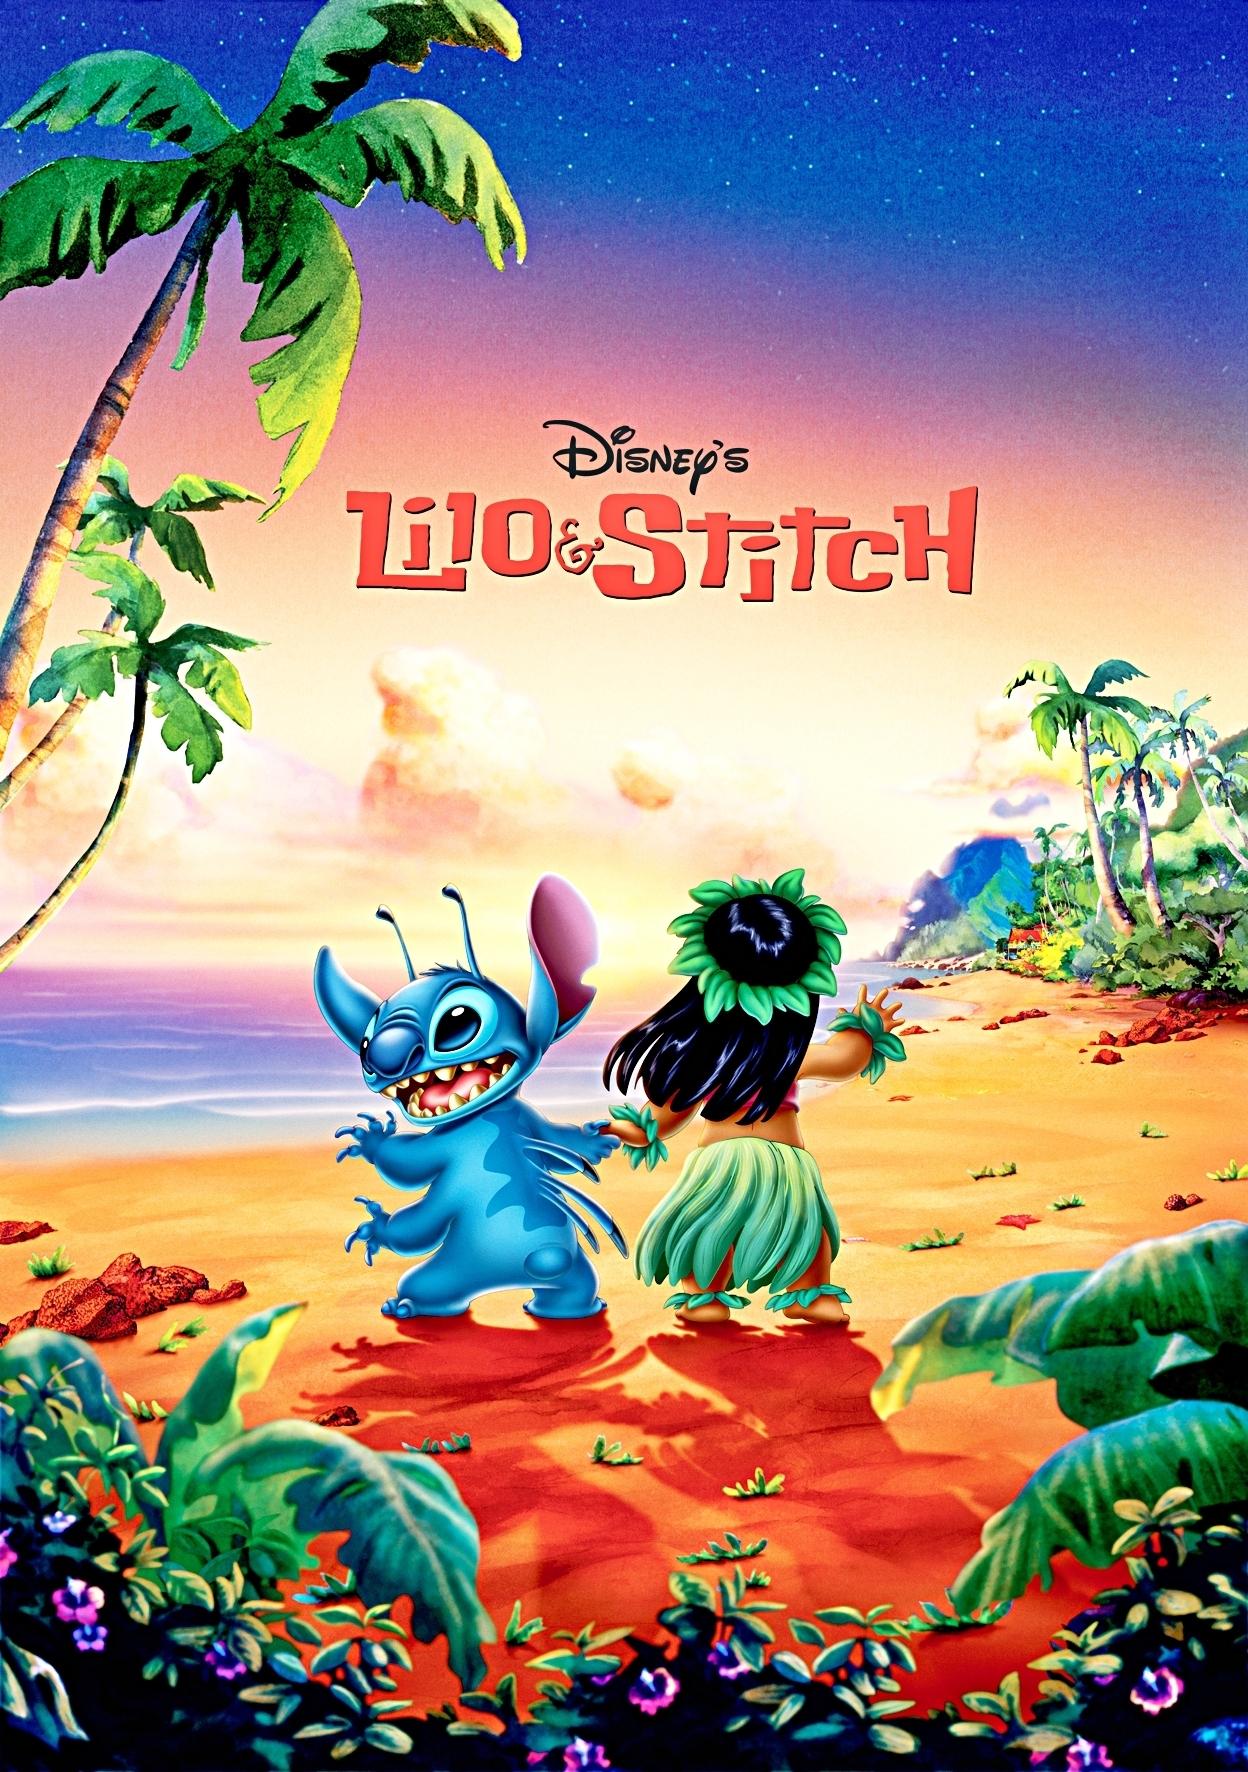 Lilo & Stitch Poster - Disney Photo (18651967) - Fanpop tout Lilo Et Stitch Dessin Animé